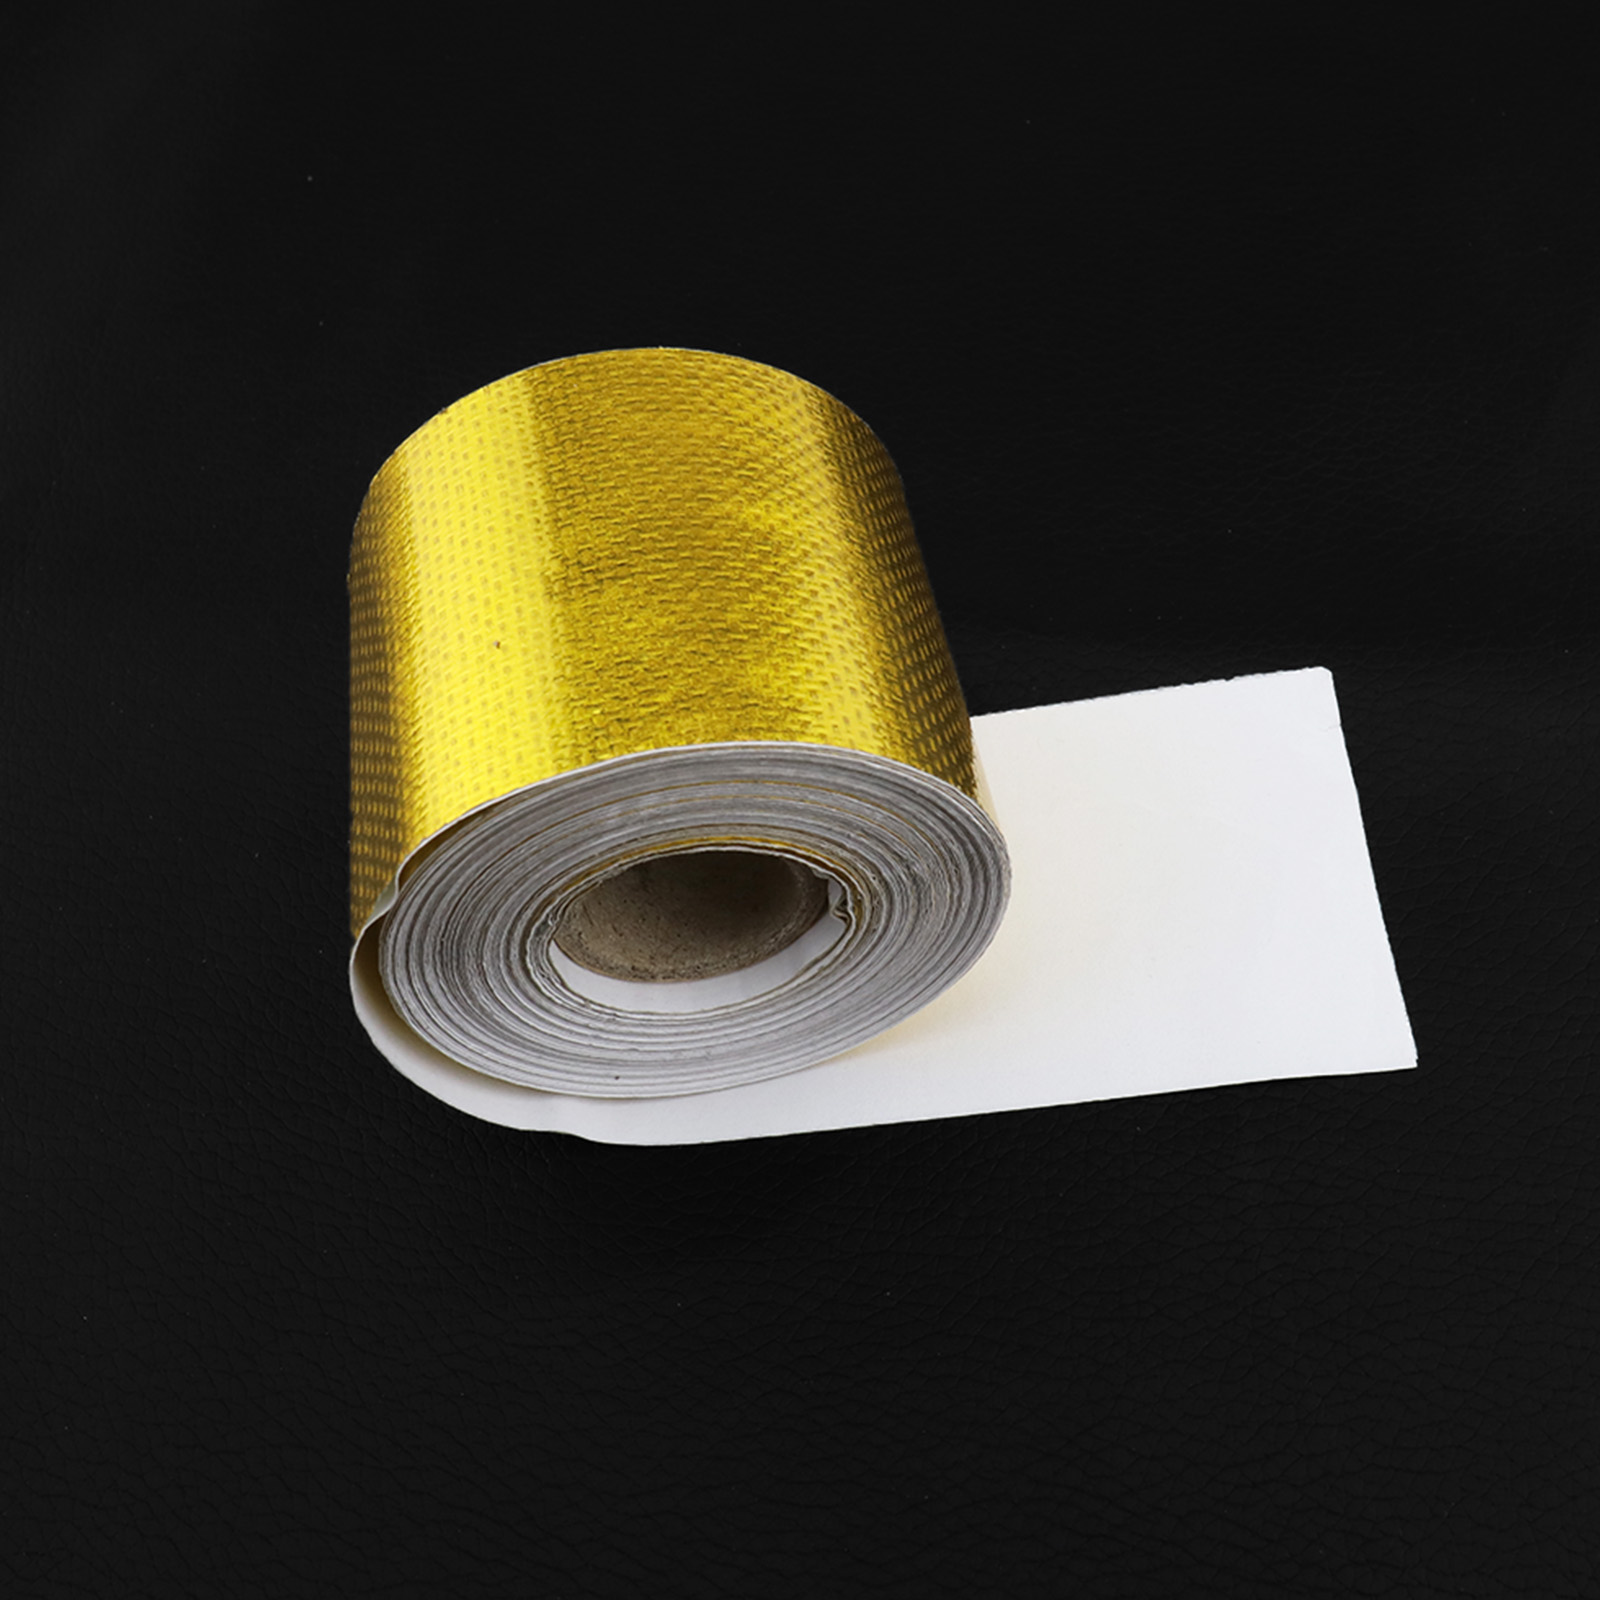 K2 Auspuff Reparatur Band Auspuffband 5cm breit 1m lang